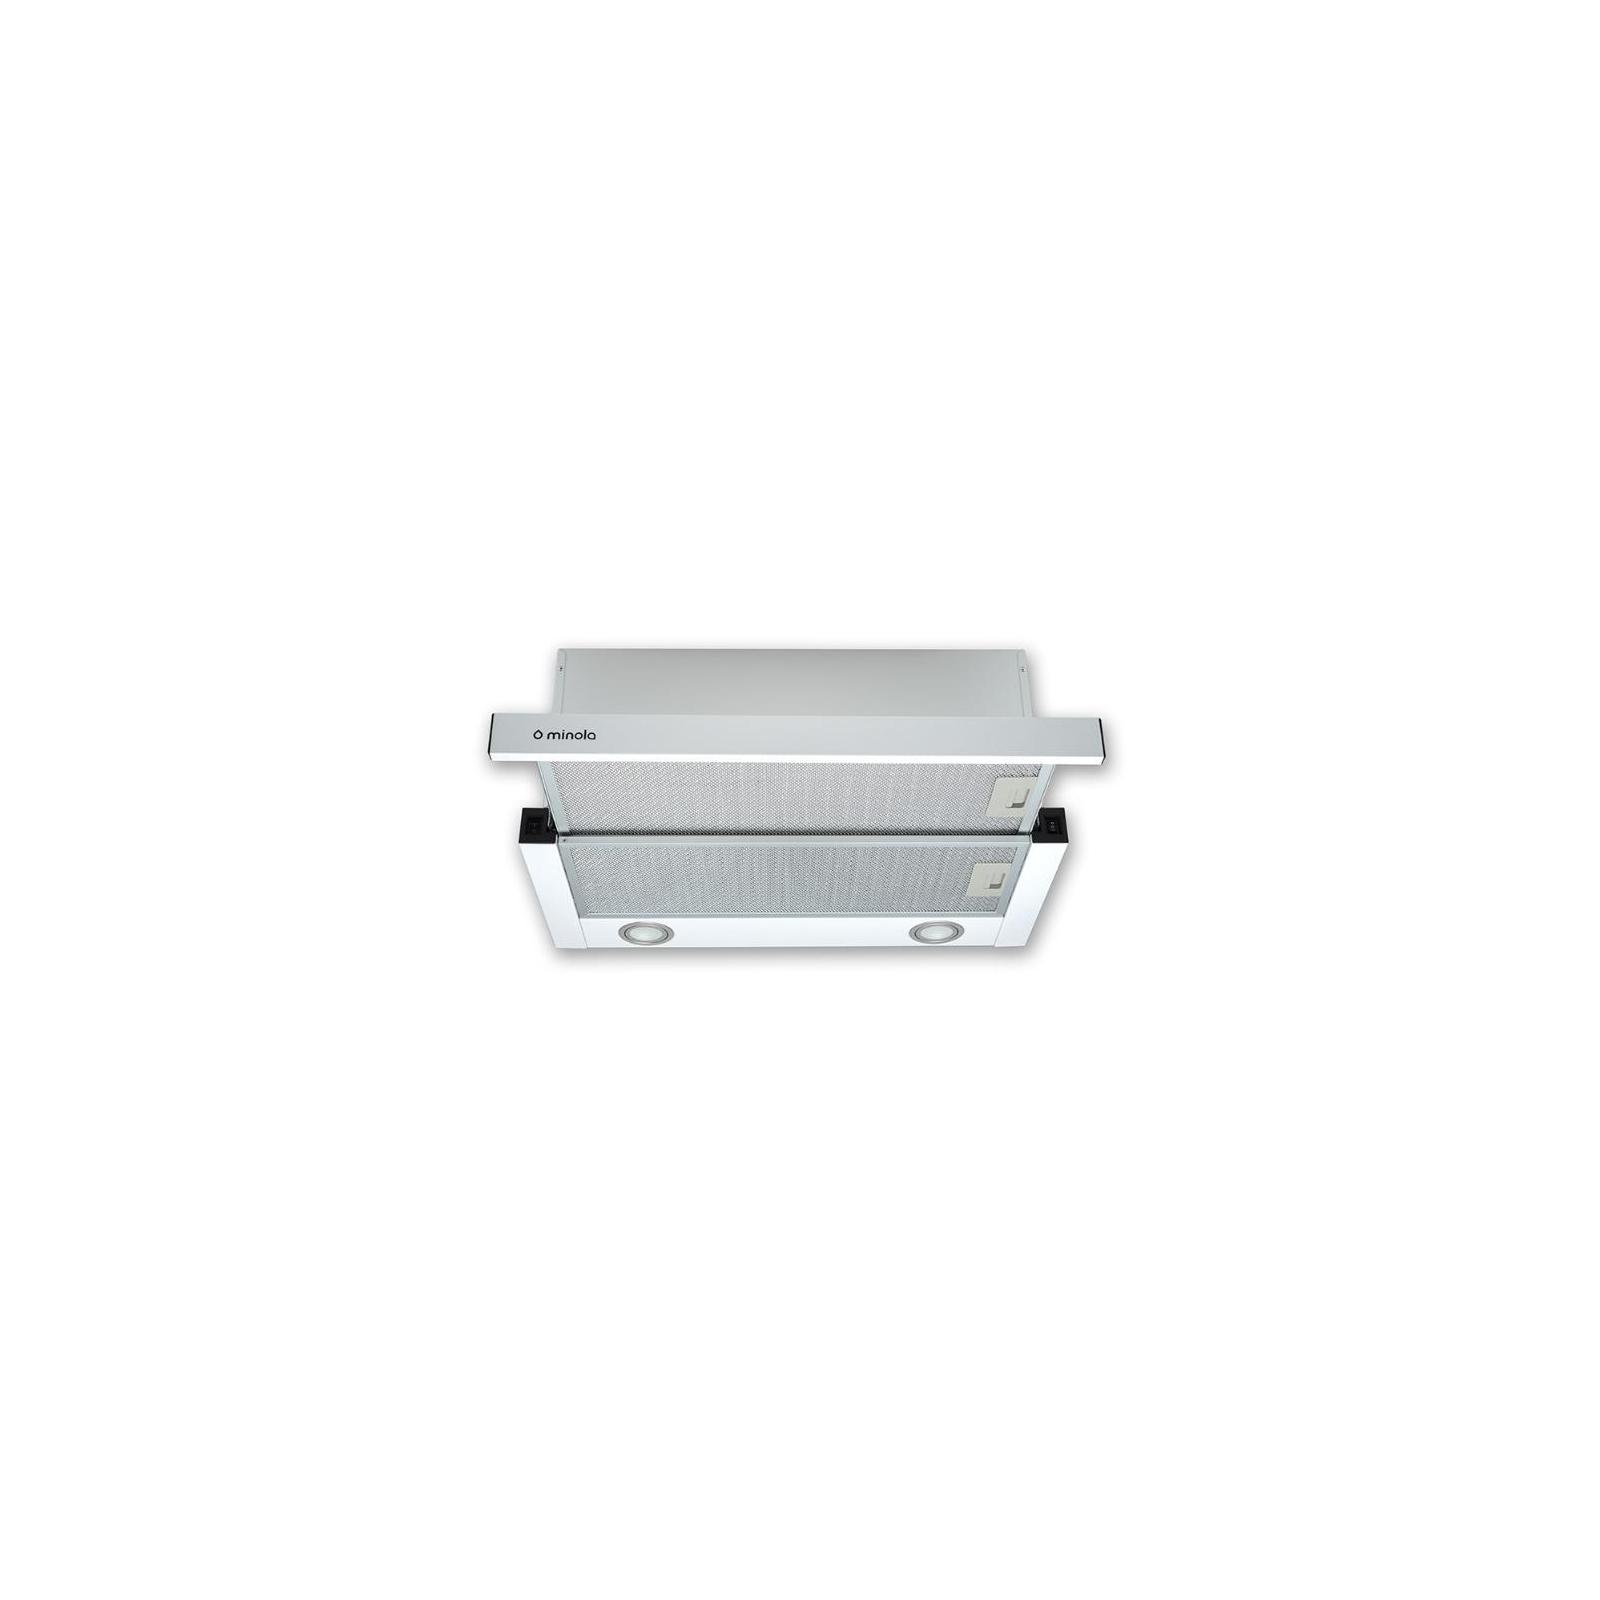 Вытяжка кухонная MINOLA HTL 6812 WH 1200 LED